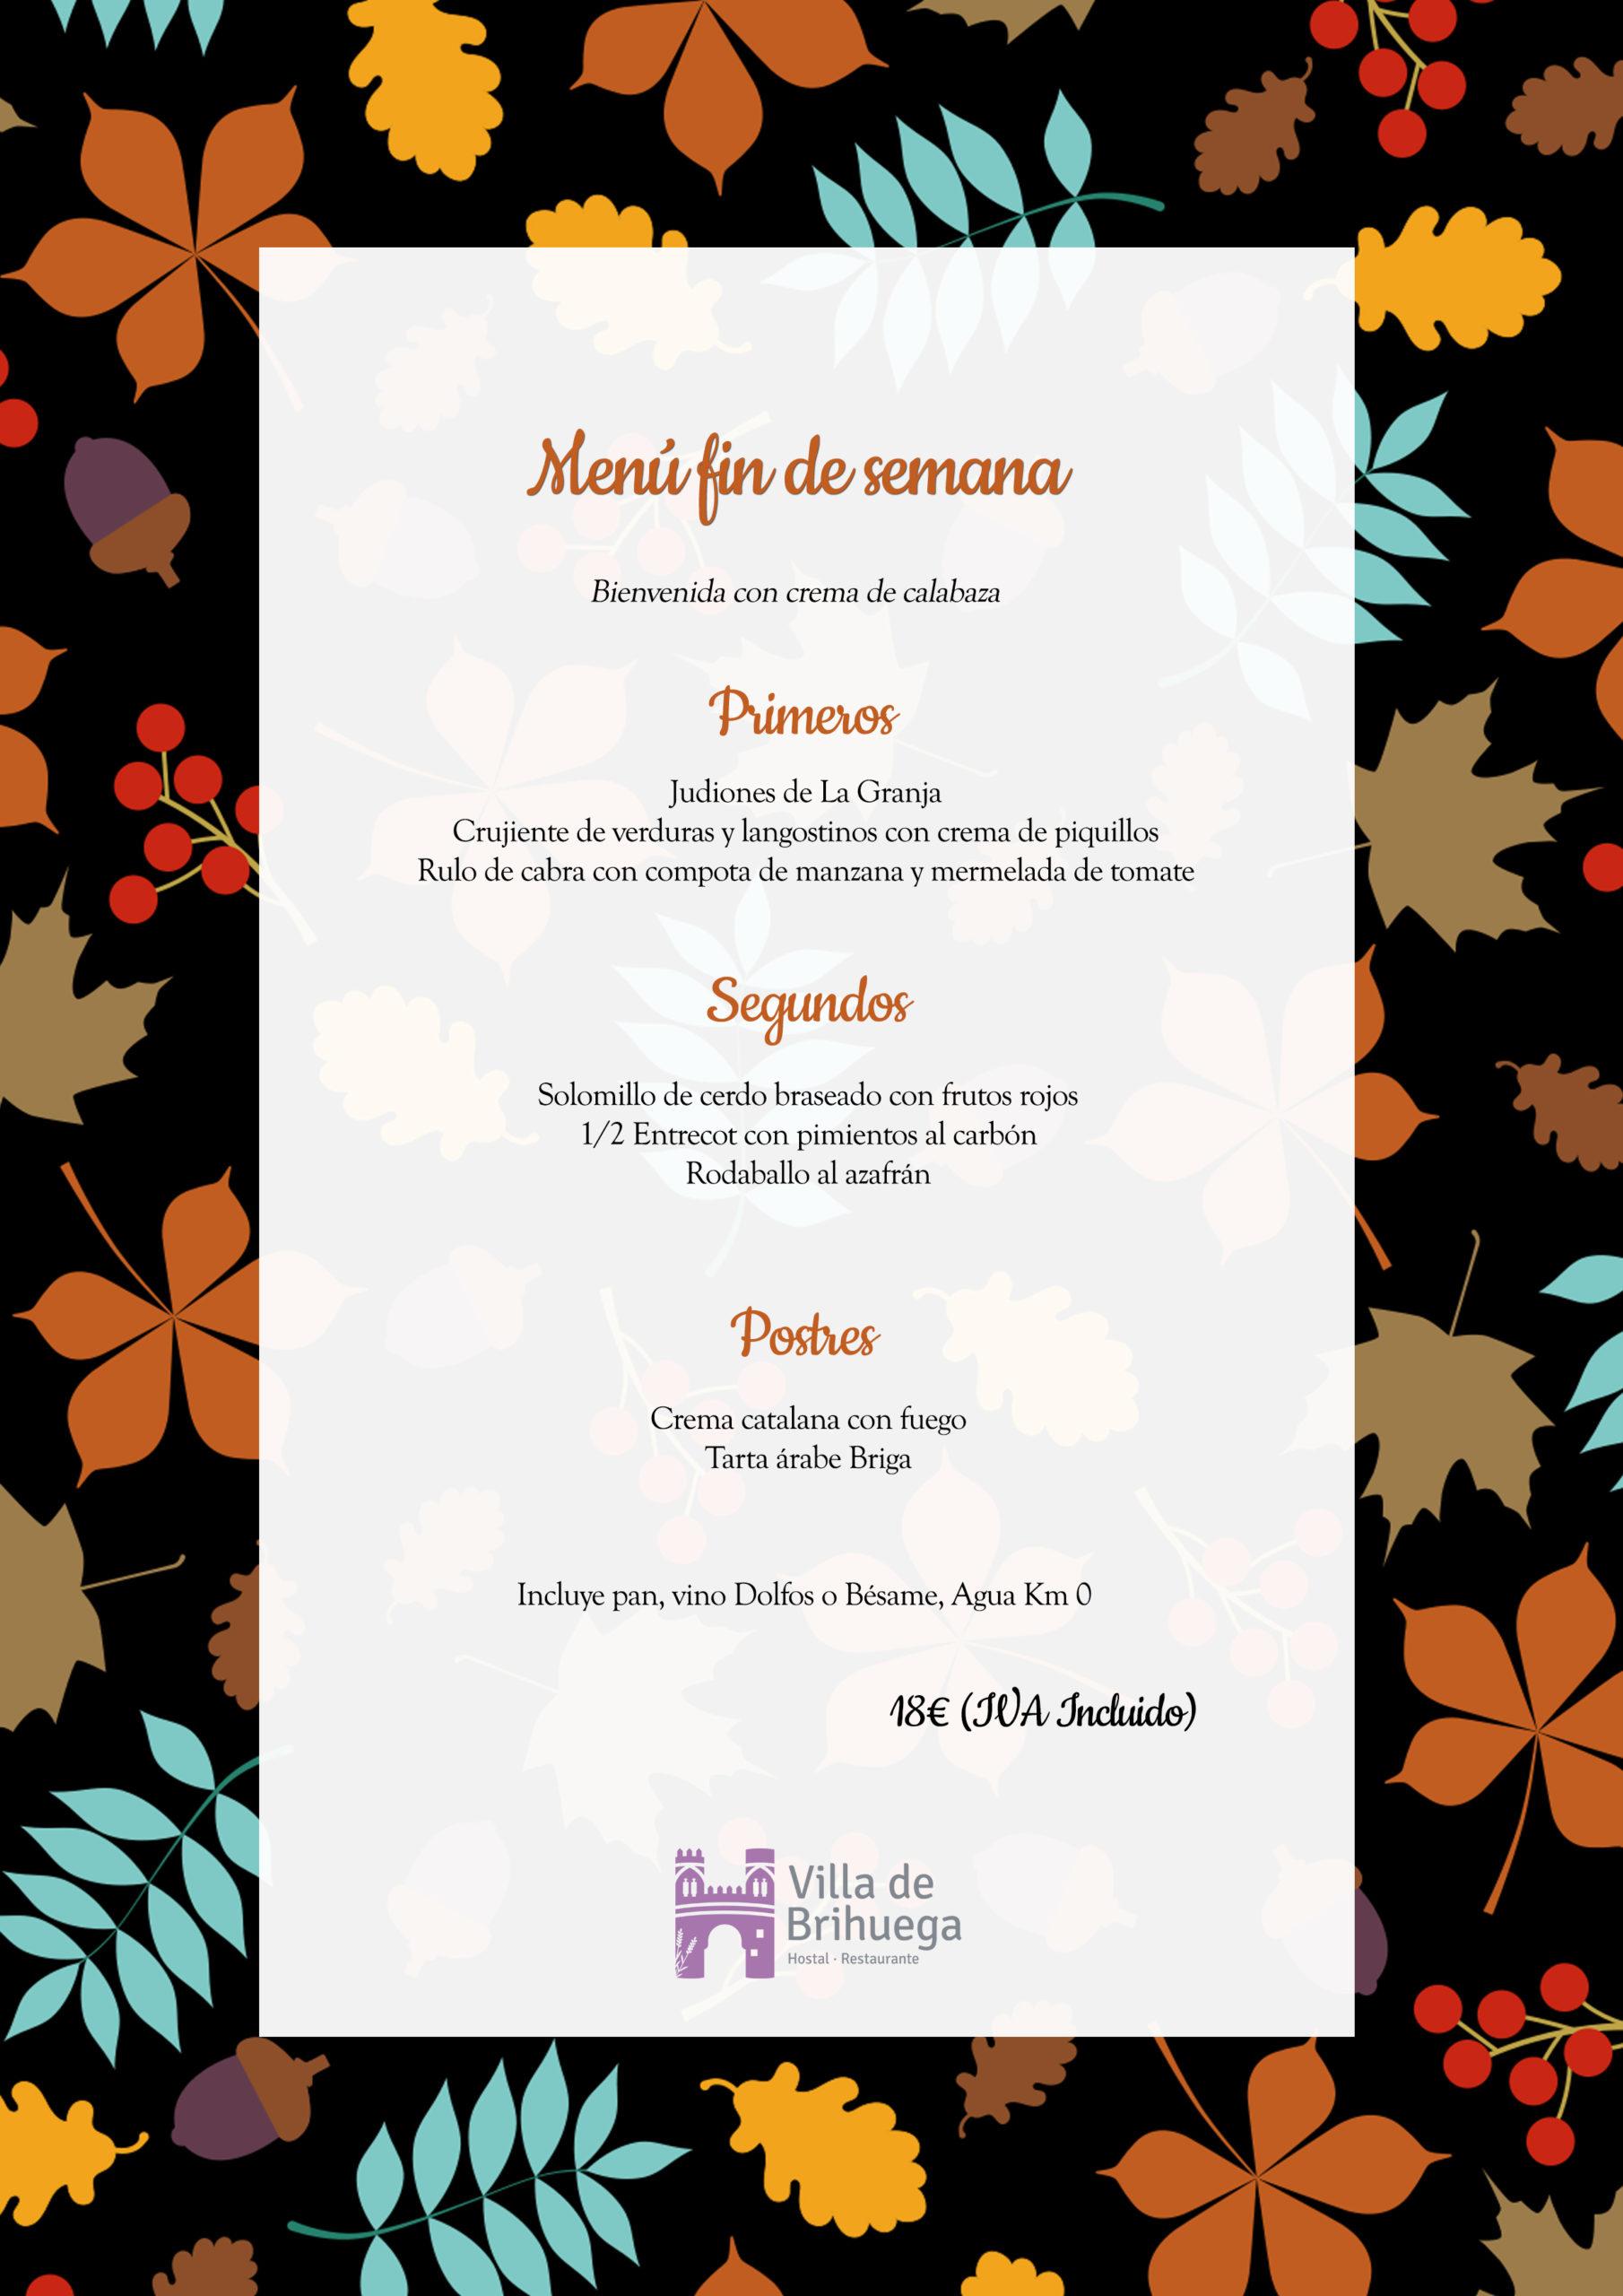 menú fin de semana Restaurante Villa de Brihuega